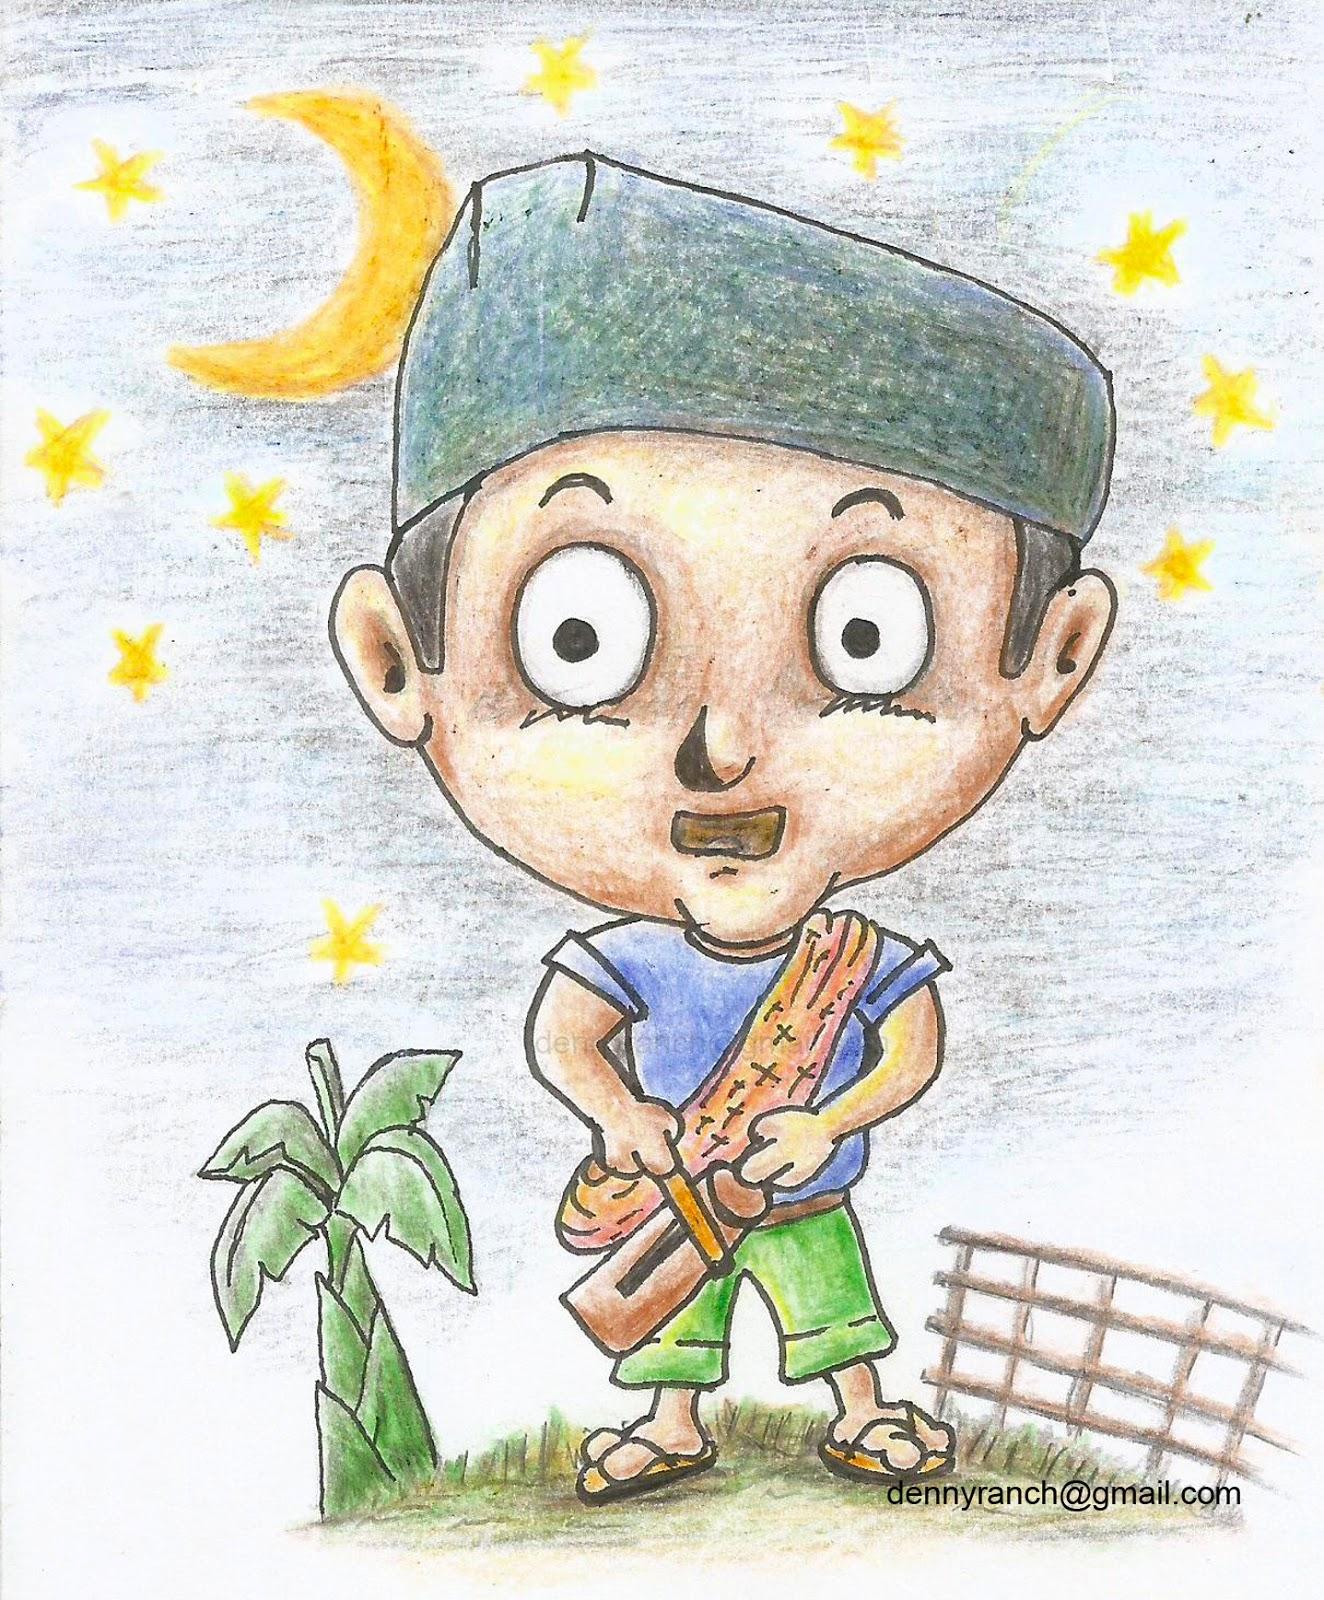 Gambar Kartun Orang Ronda Aliansi kartun